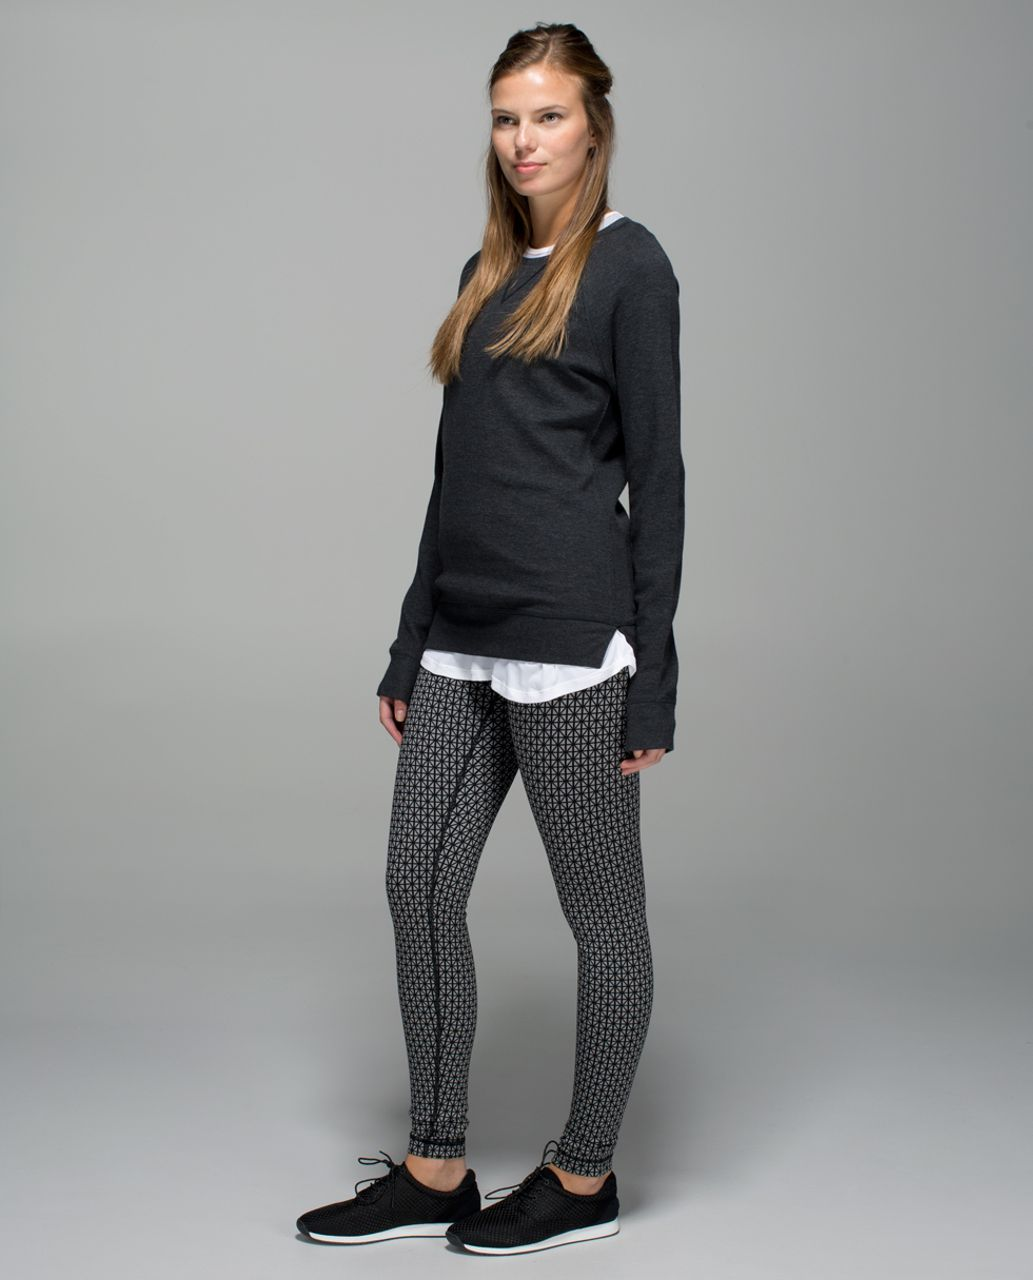 Lululemon Wunder Under Pant *Full-On Luon - Tri Geo Silver Spoon Black